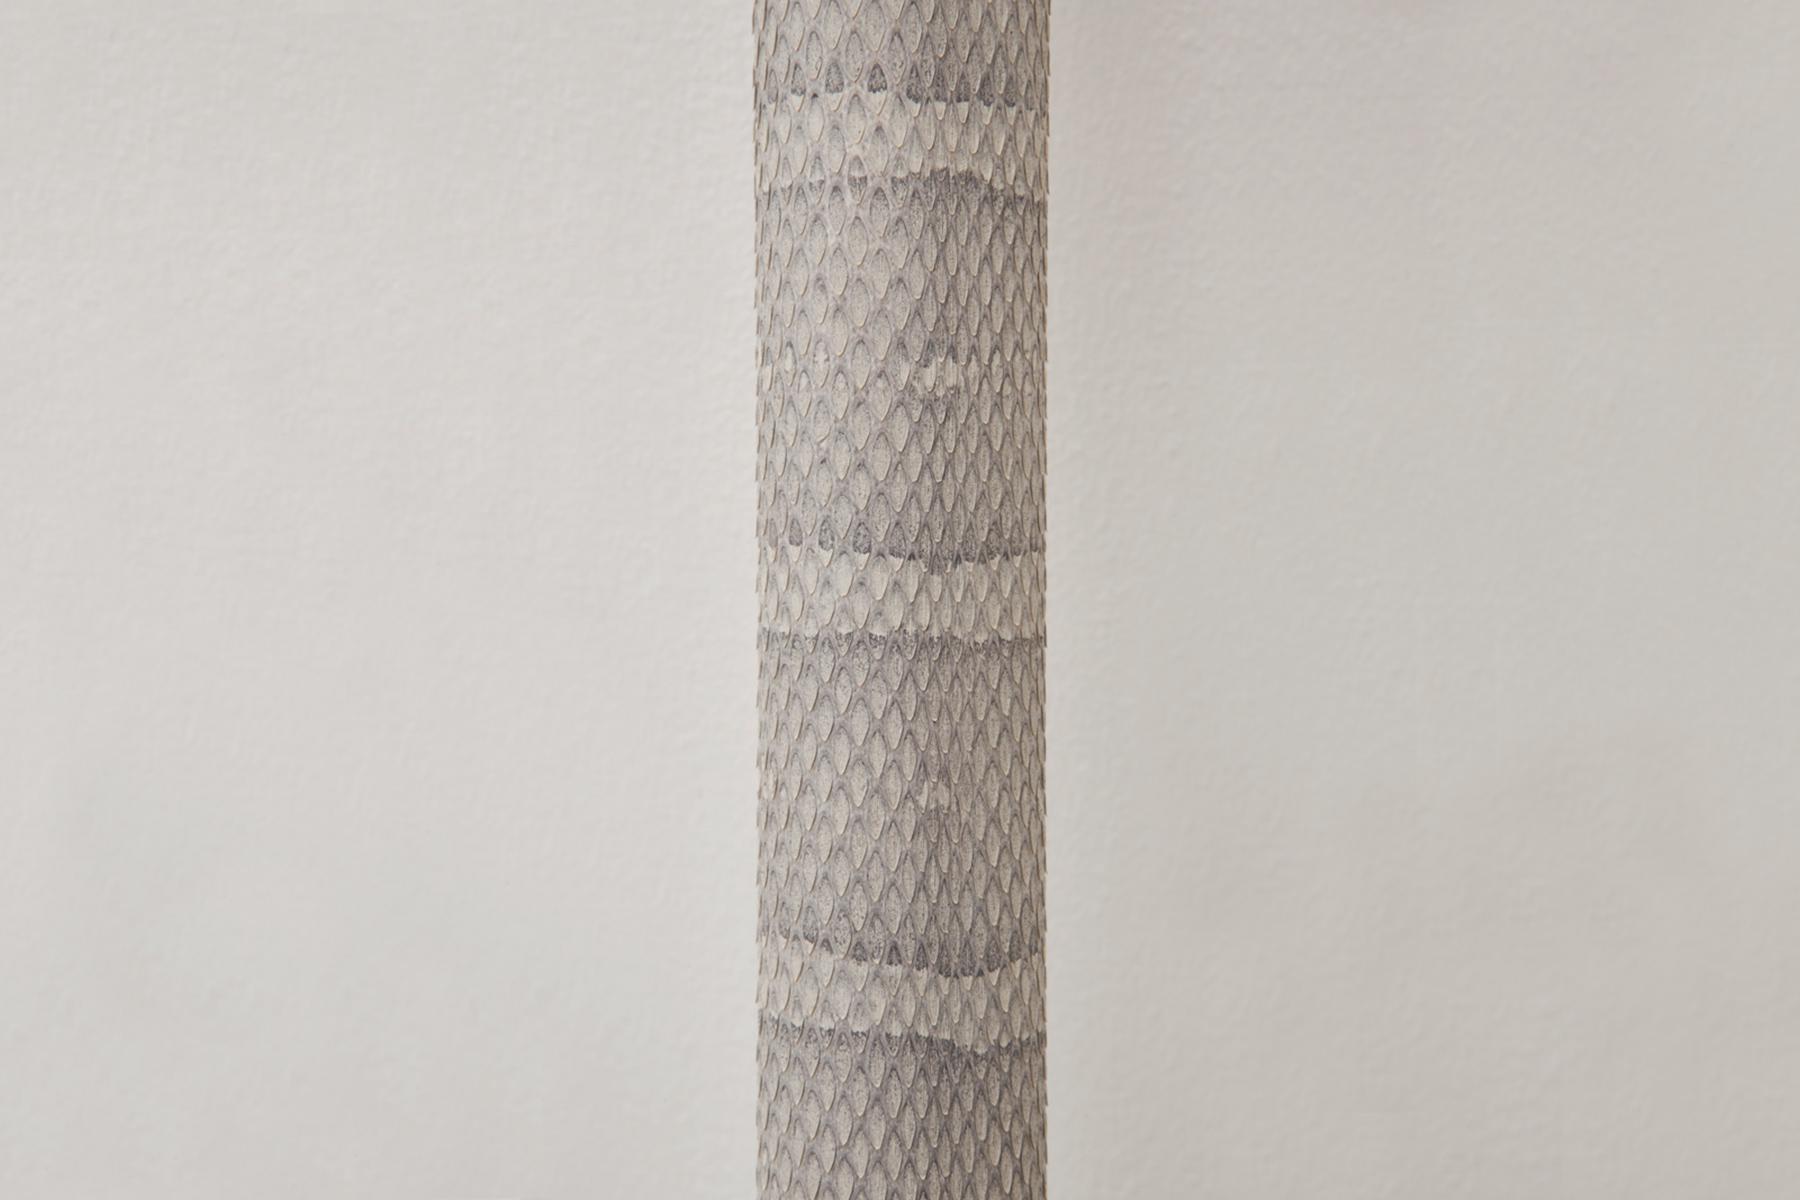 Alastair Mackie|A.C.R.O.N.Y.M.|2013|snake|skin|aluminium|sculpture